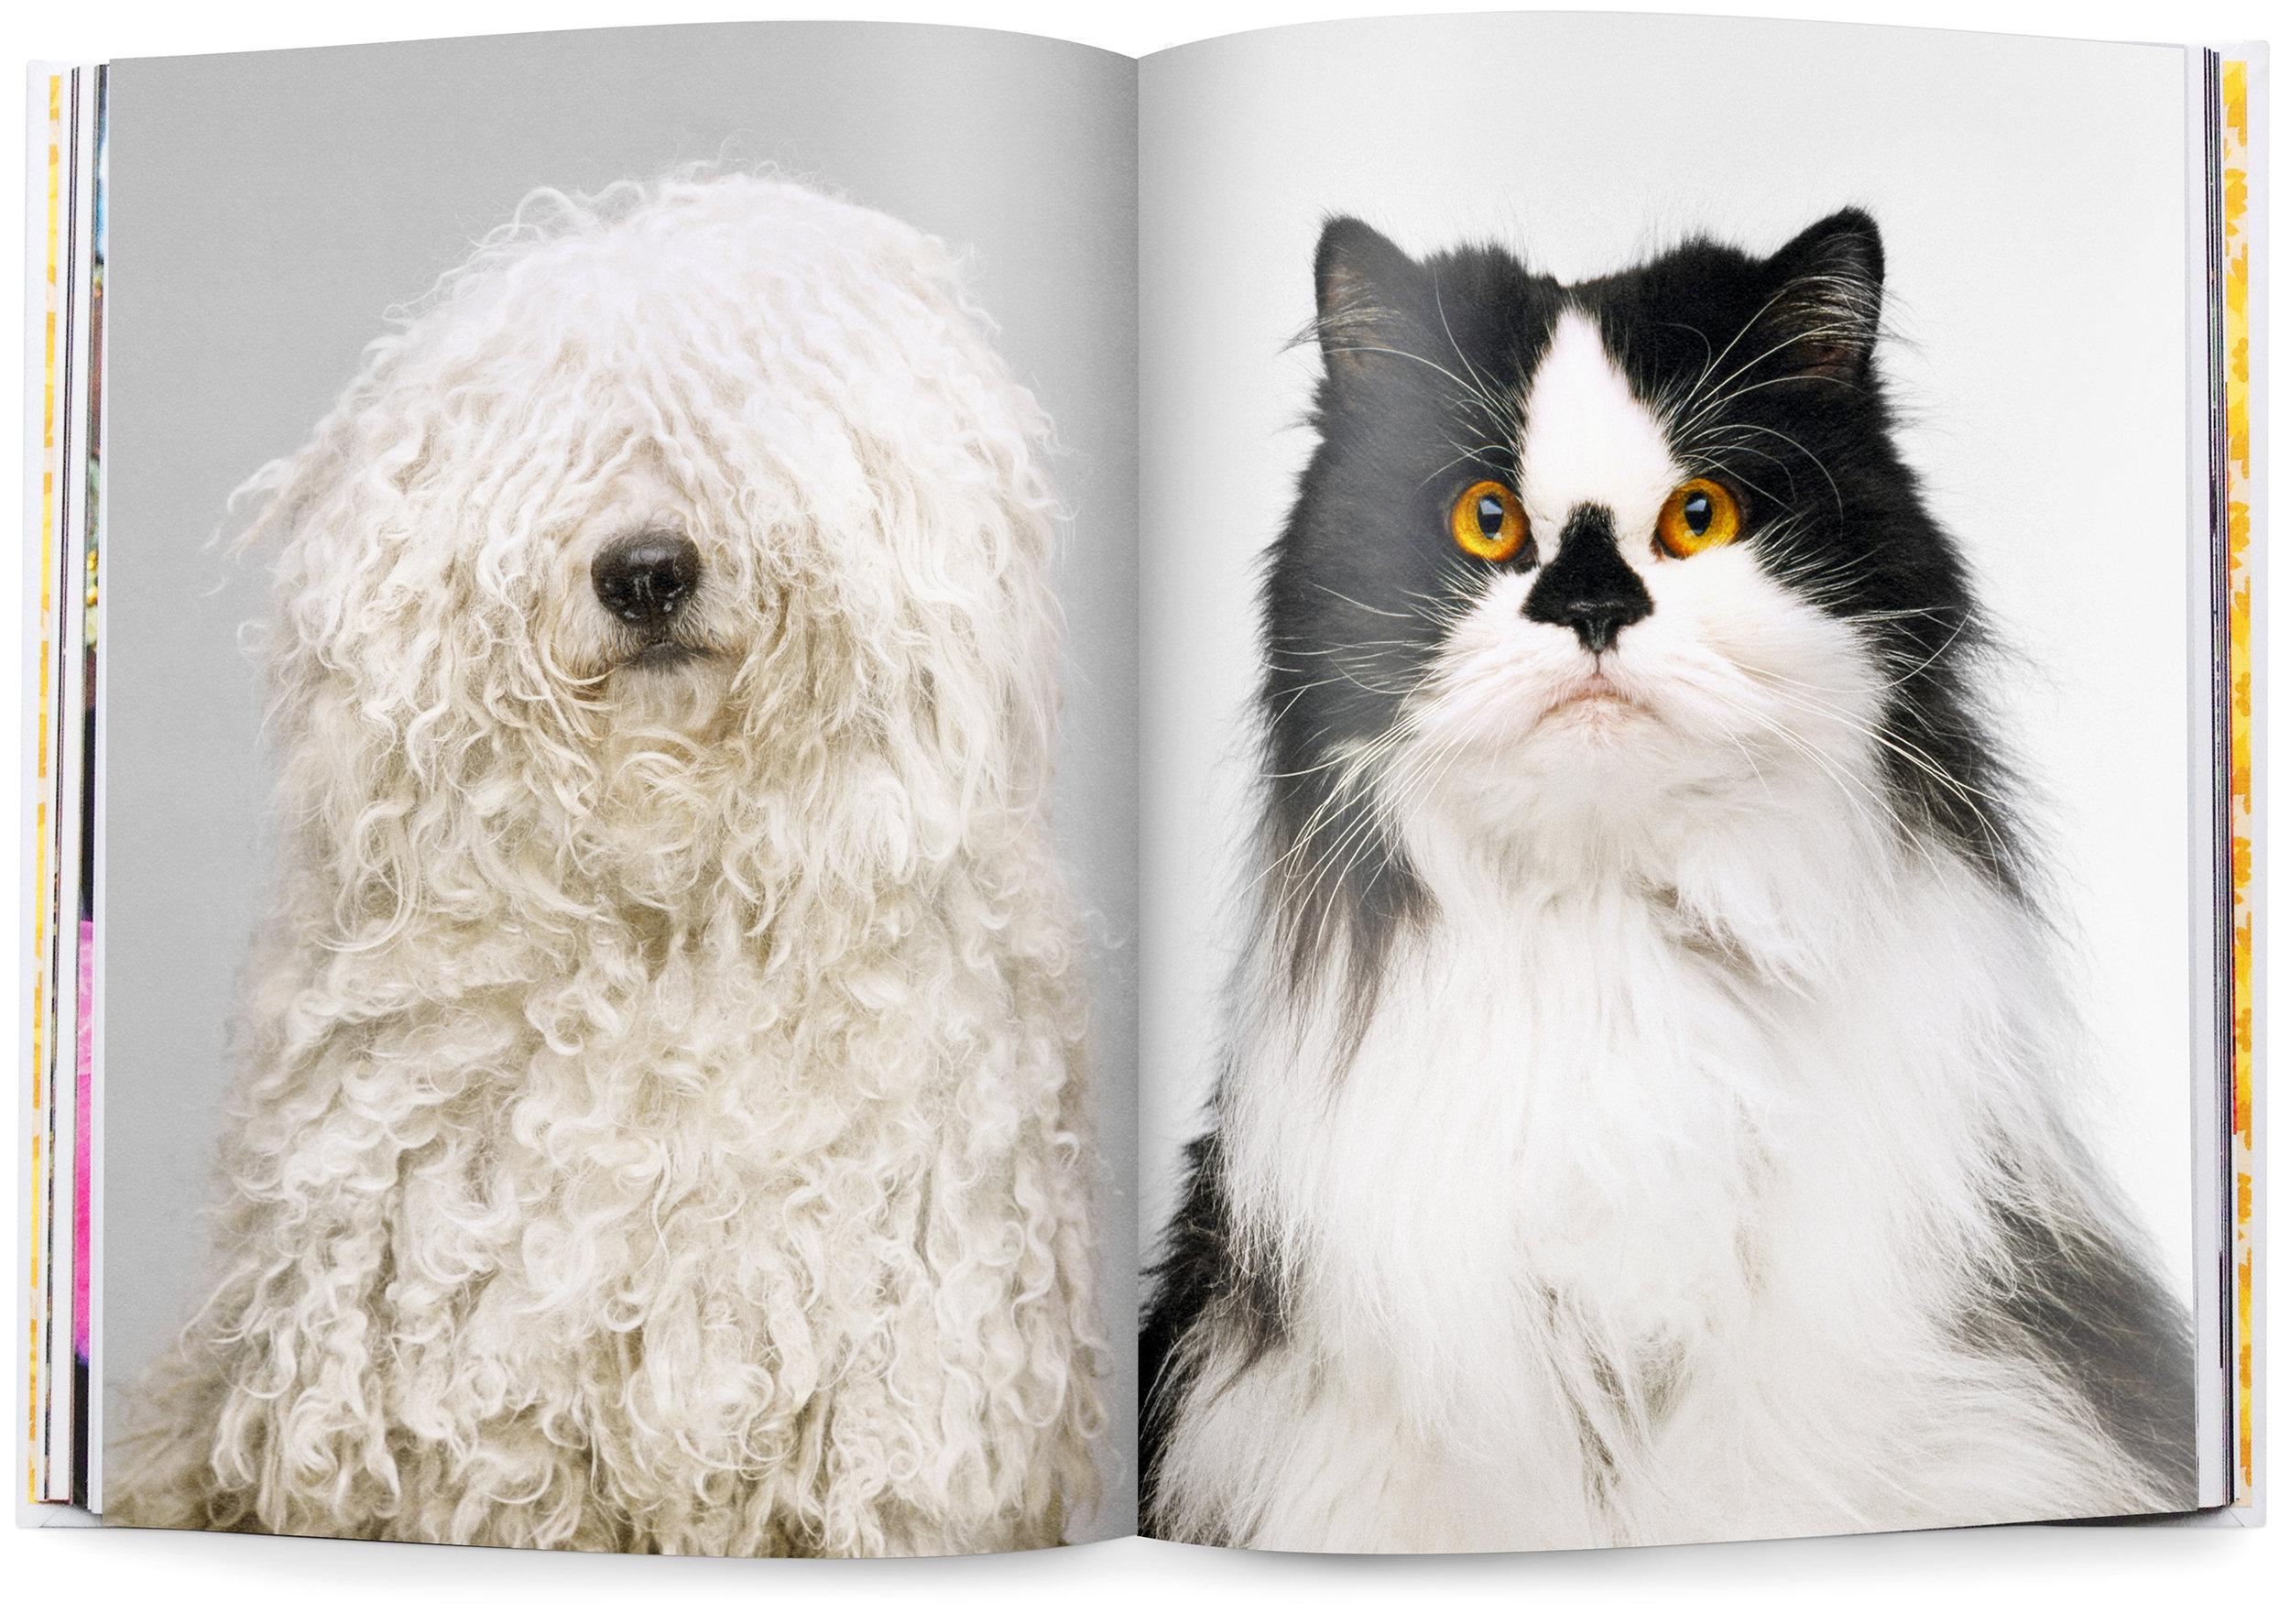 Trisha_Groves_FlashBack_book_animals_1.jpg